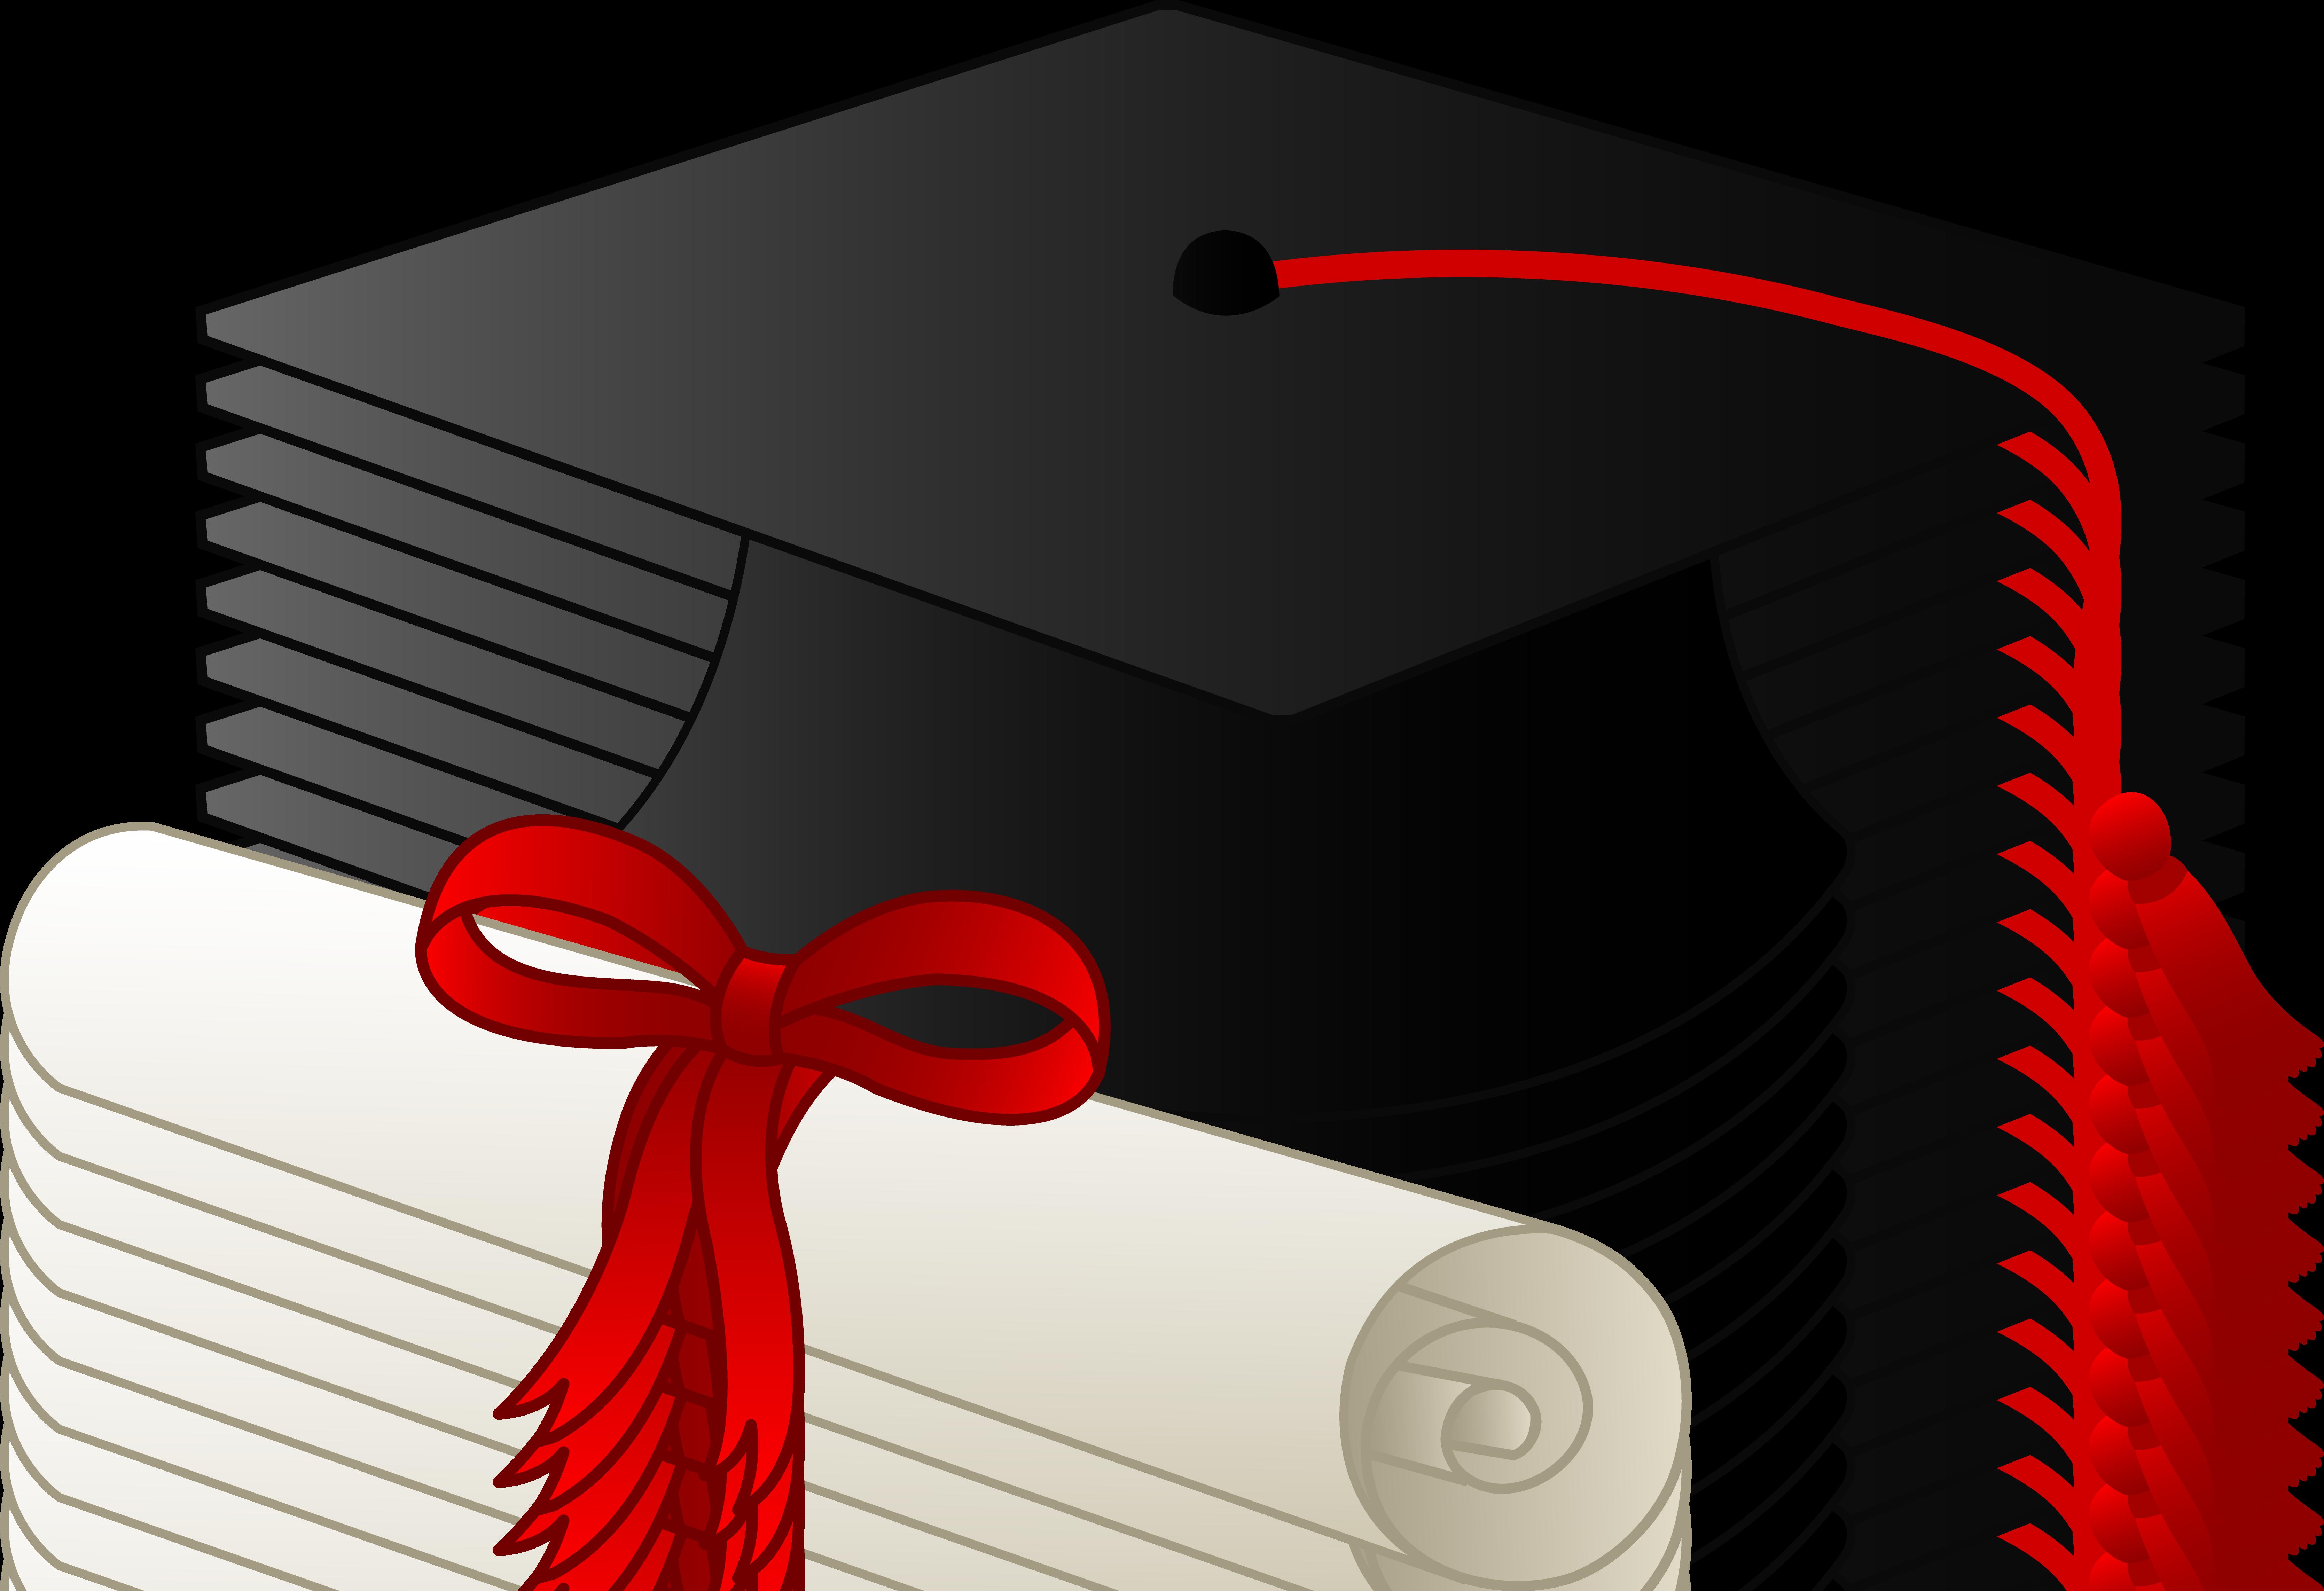 Graduate Clip Art